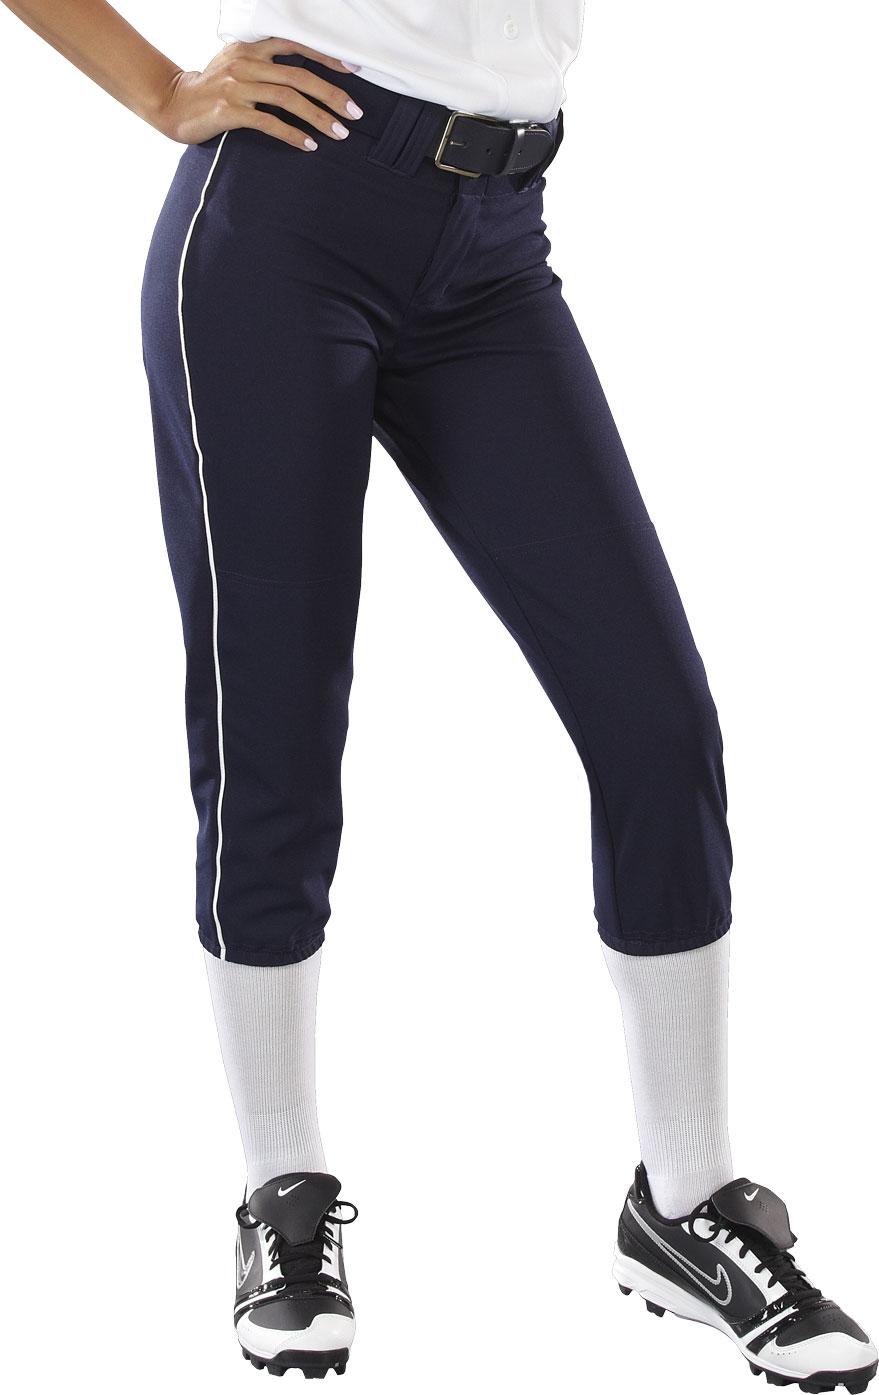 Softball Pants 3245-softball pants, low rise, teamwork athletics, 3245